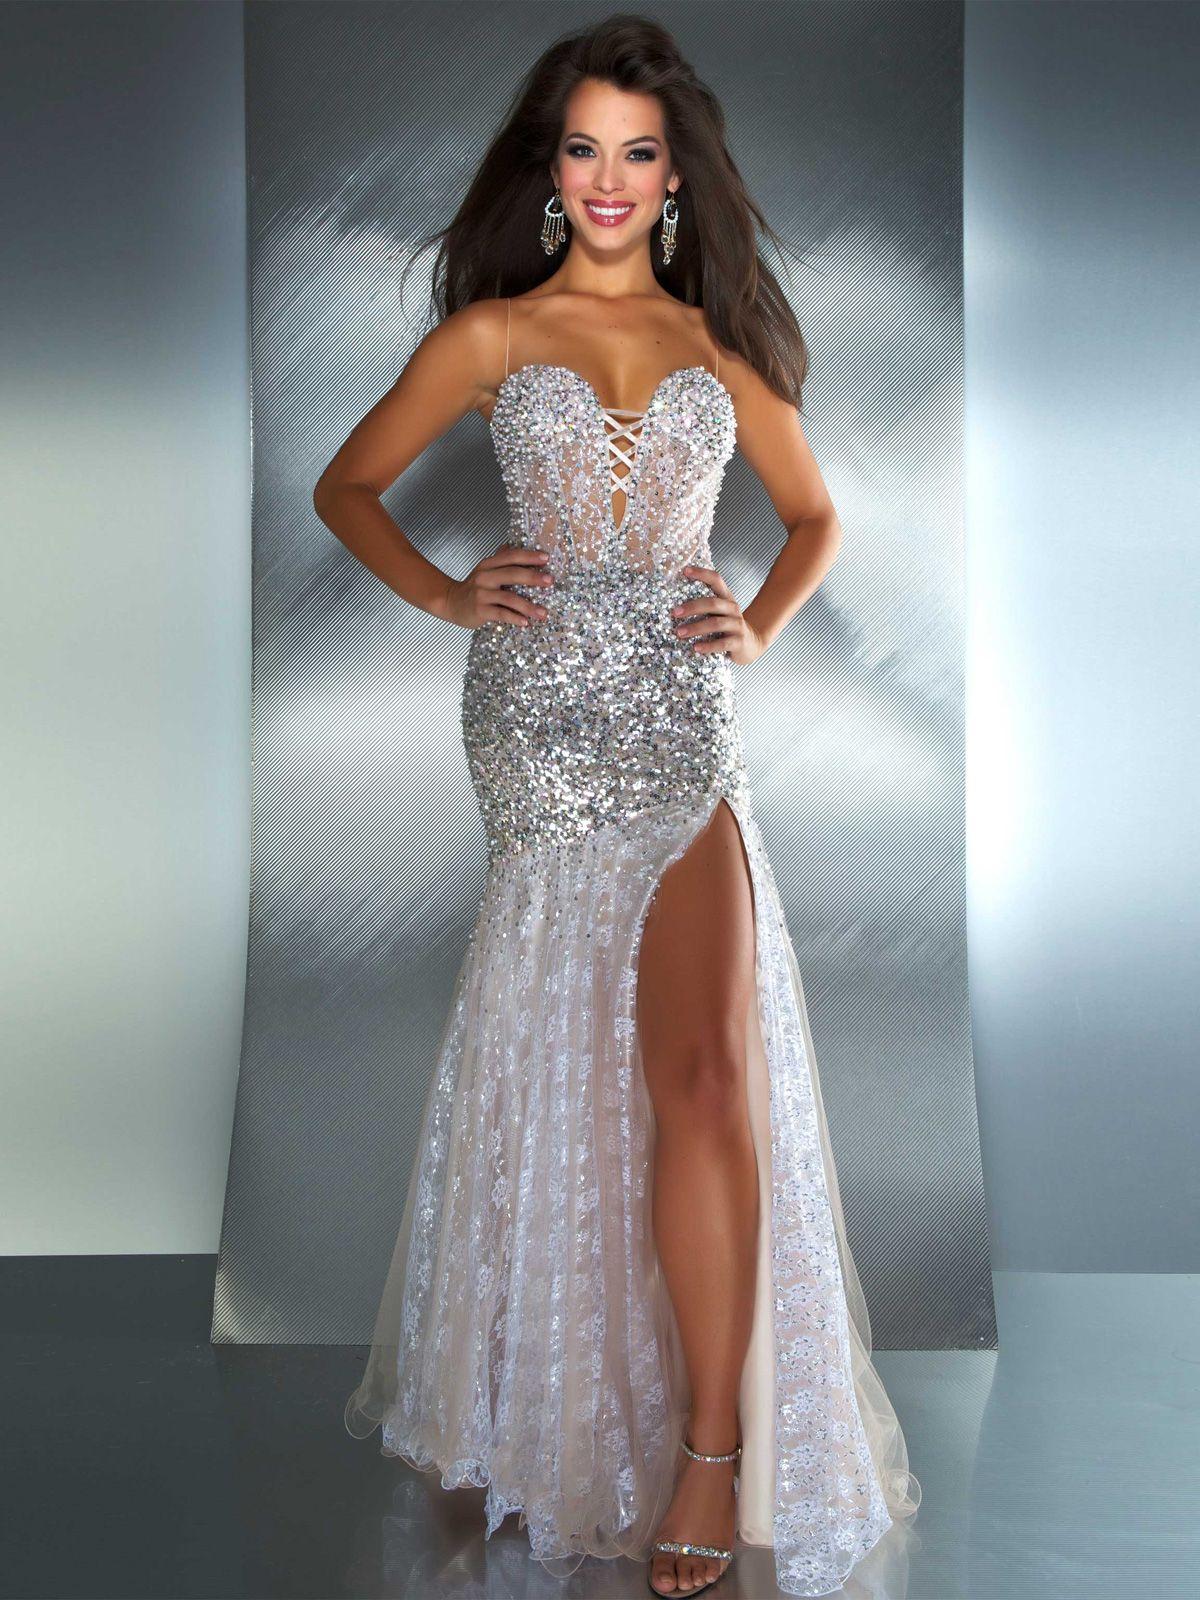 Awesome Prom Dresses Pensacola Fl Frieze - Wedding Dress Ideas ...